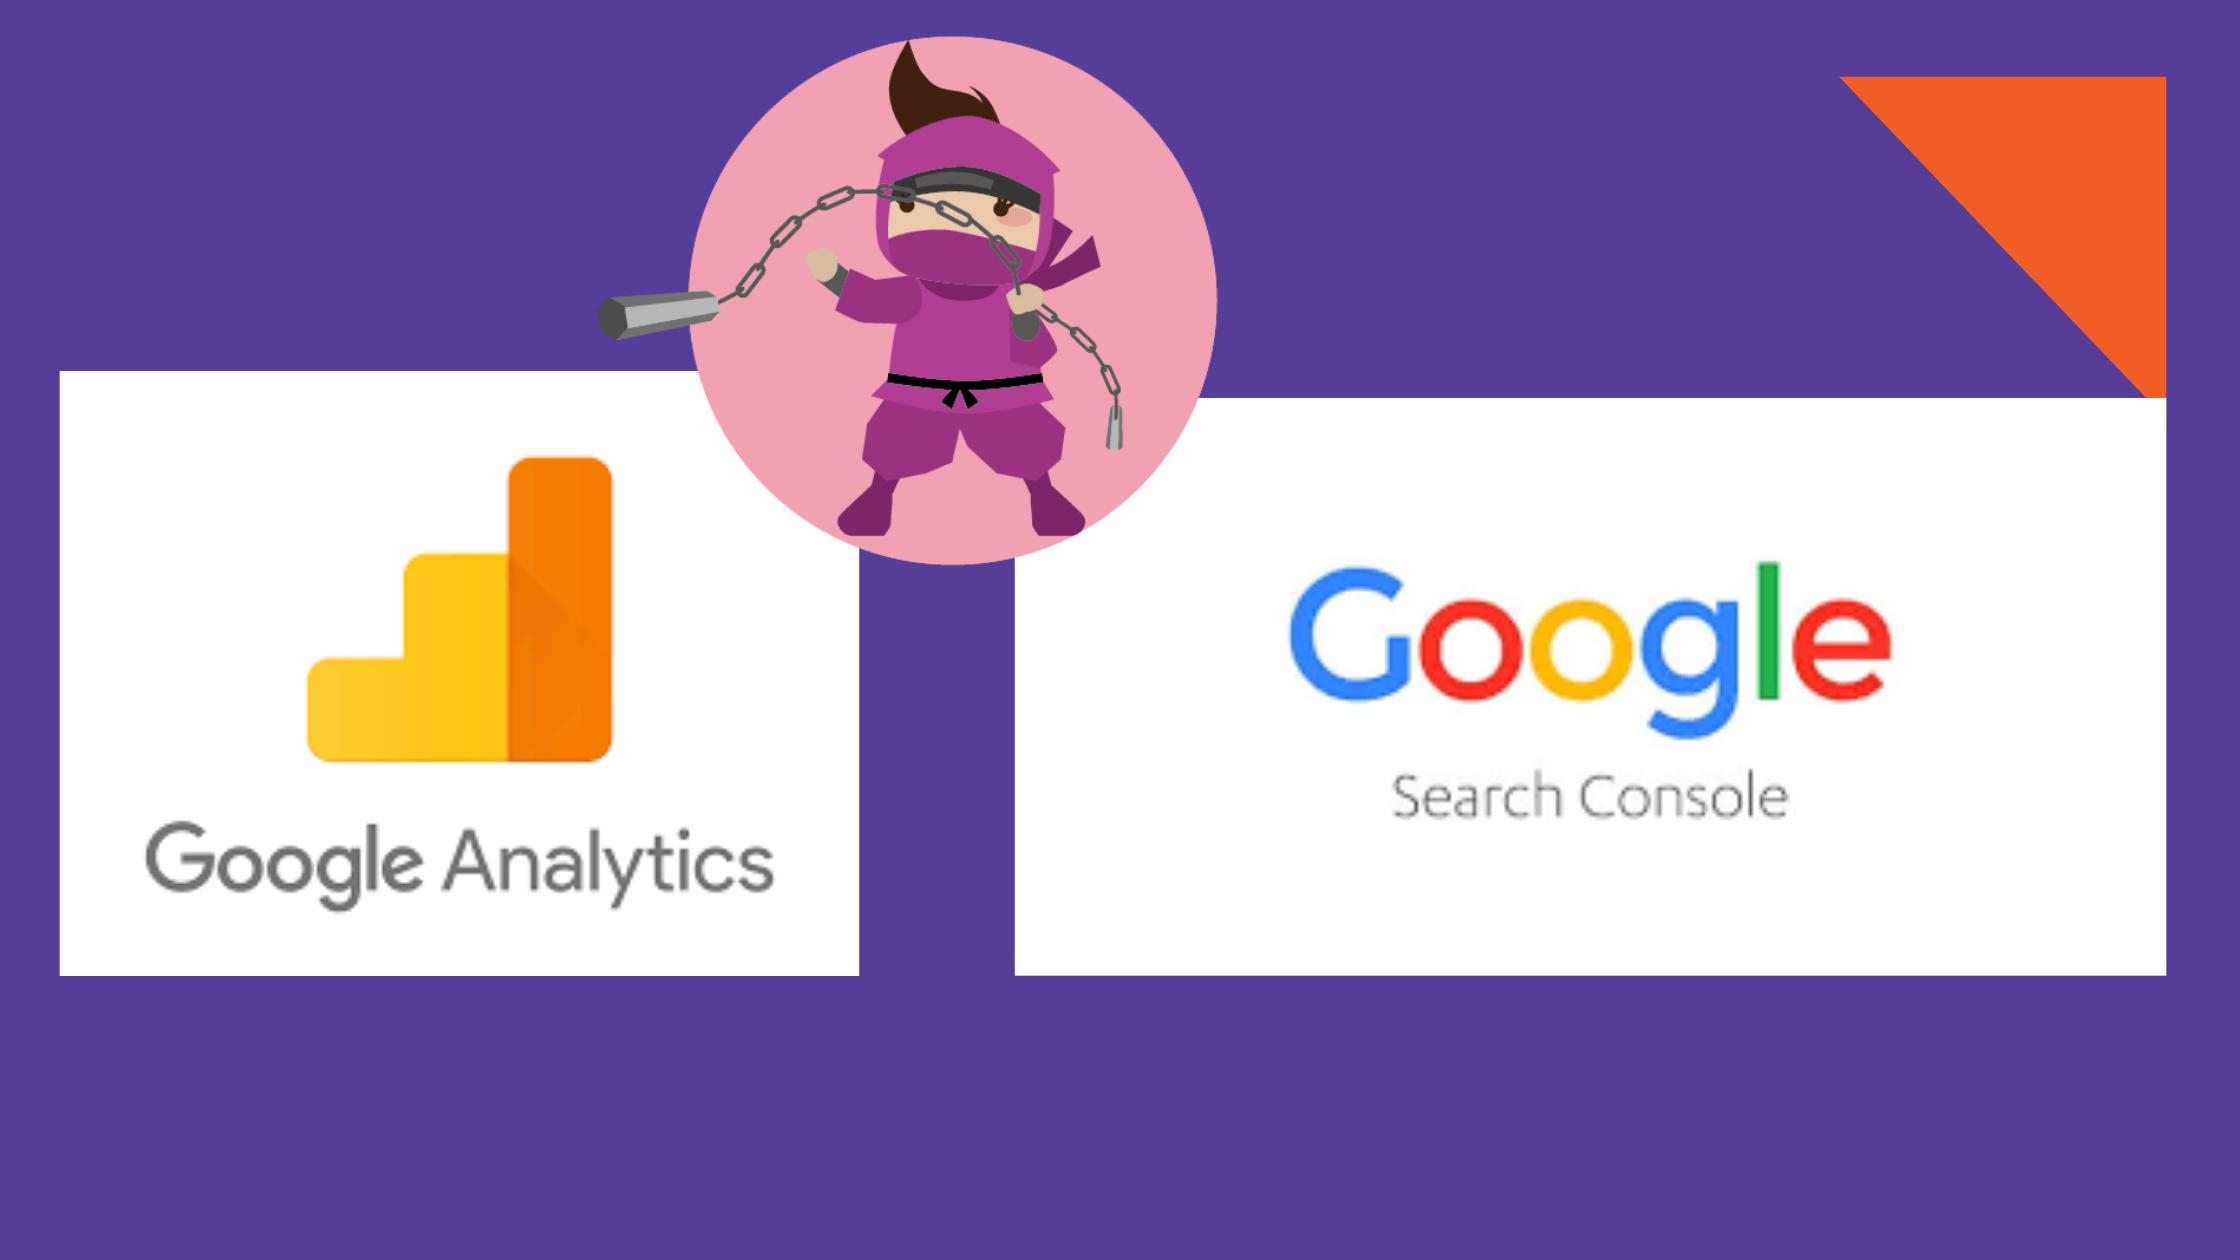 Googleアナリティクスとサーチコンソールの連携